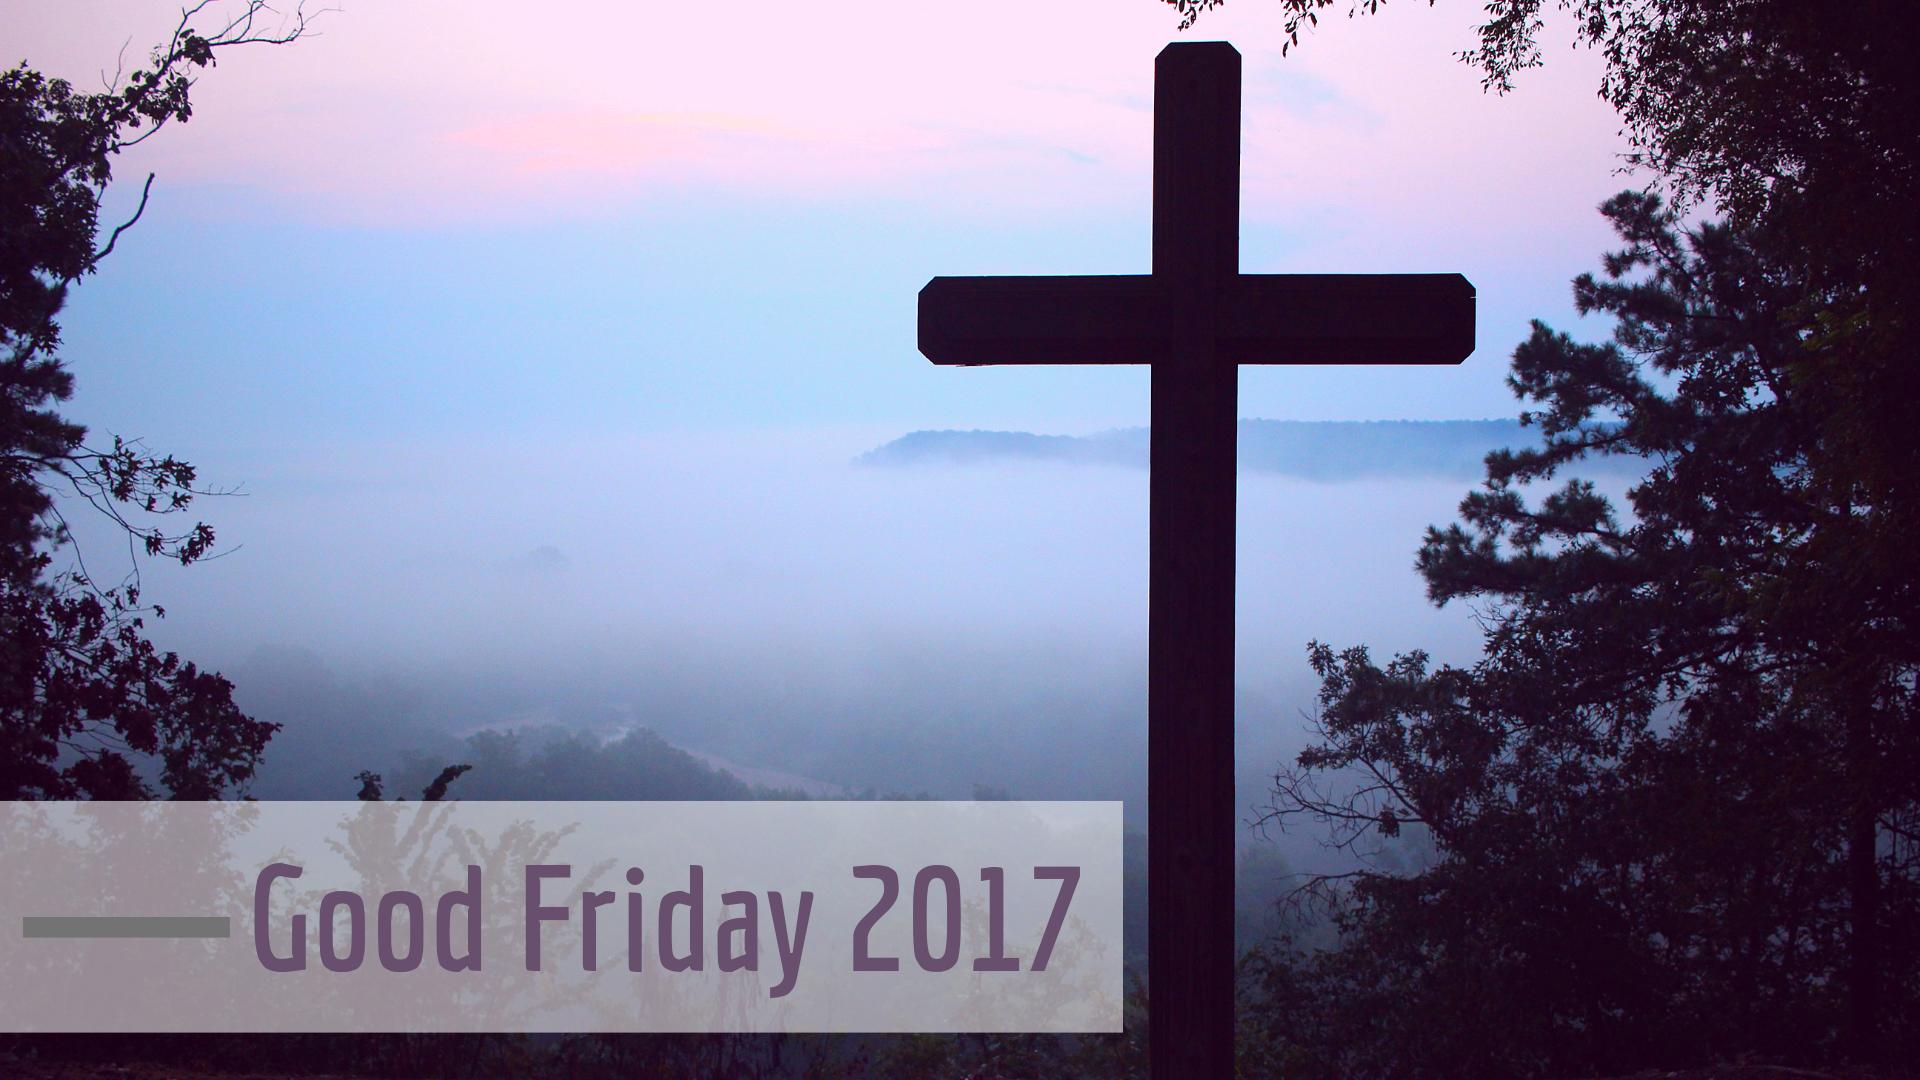 Good Friday 2017.png